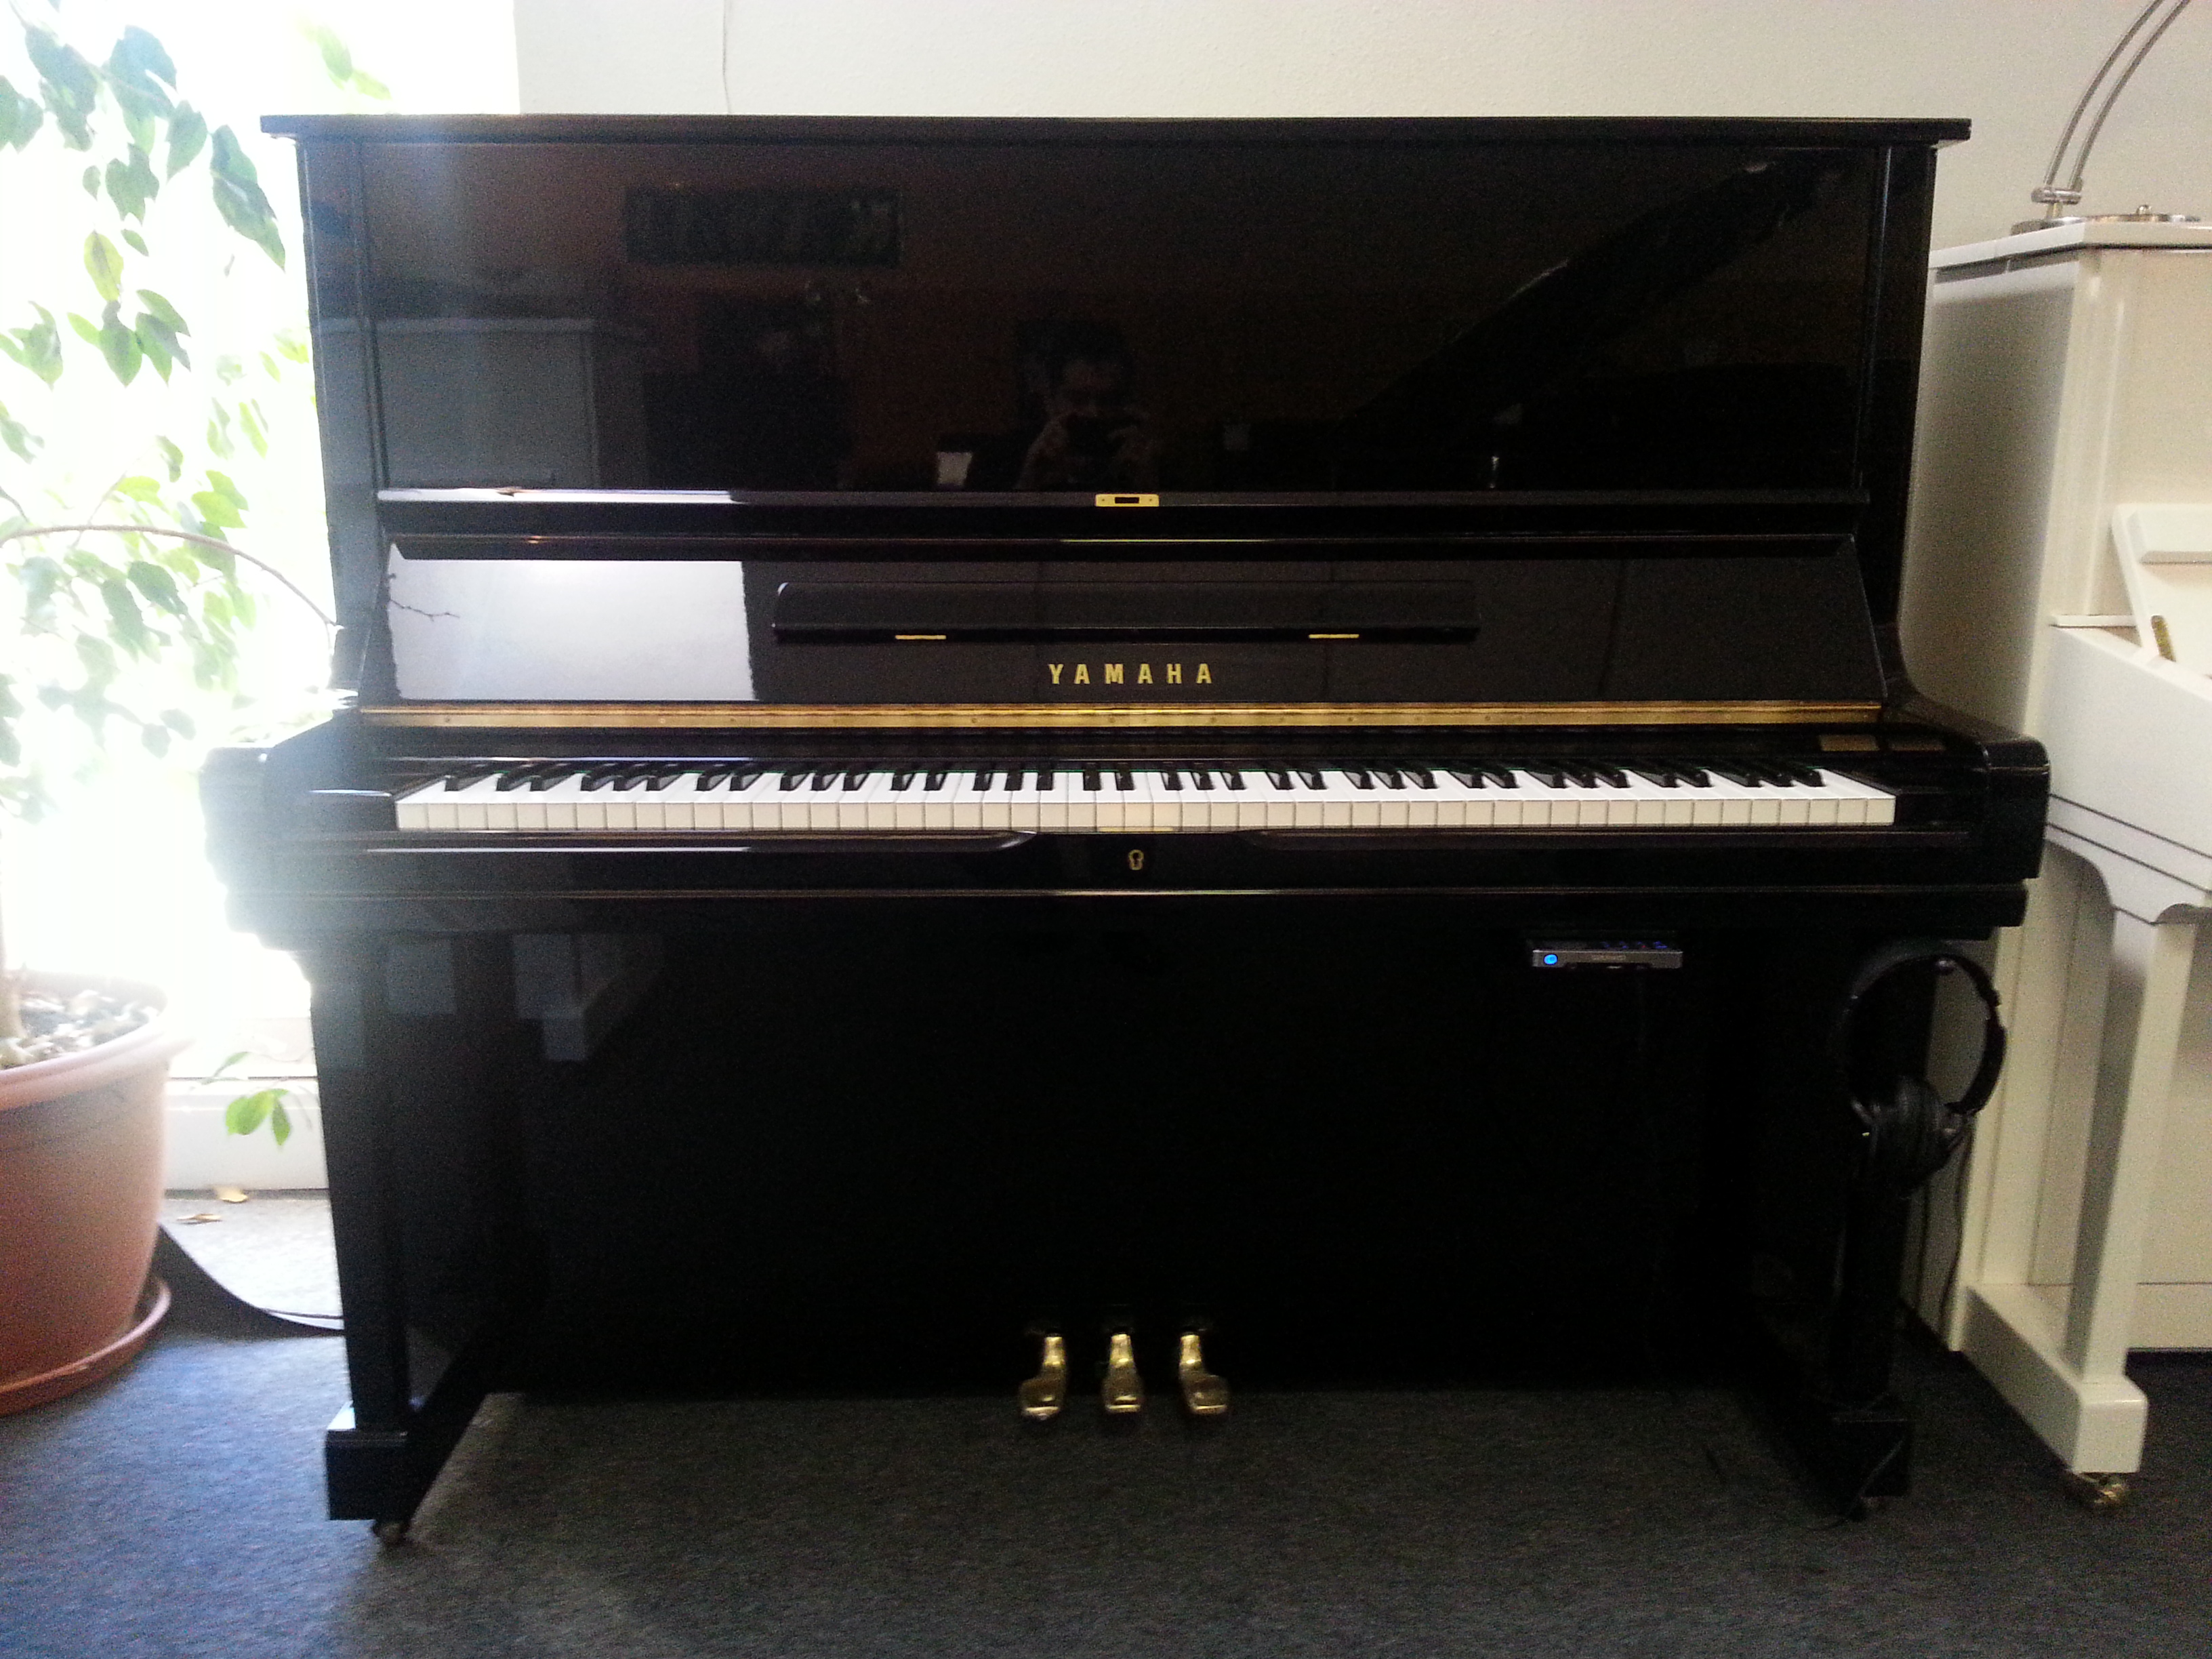 piano droit yamaha u3 silent d 39 occasion lorraine. Black Bedroom Furniture Sets. Home Design Ideas